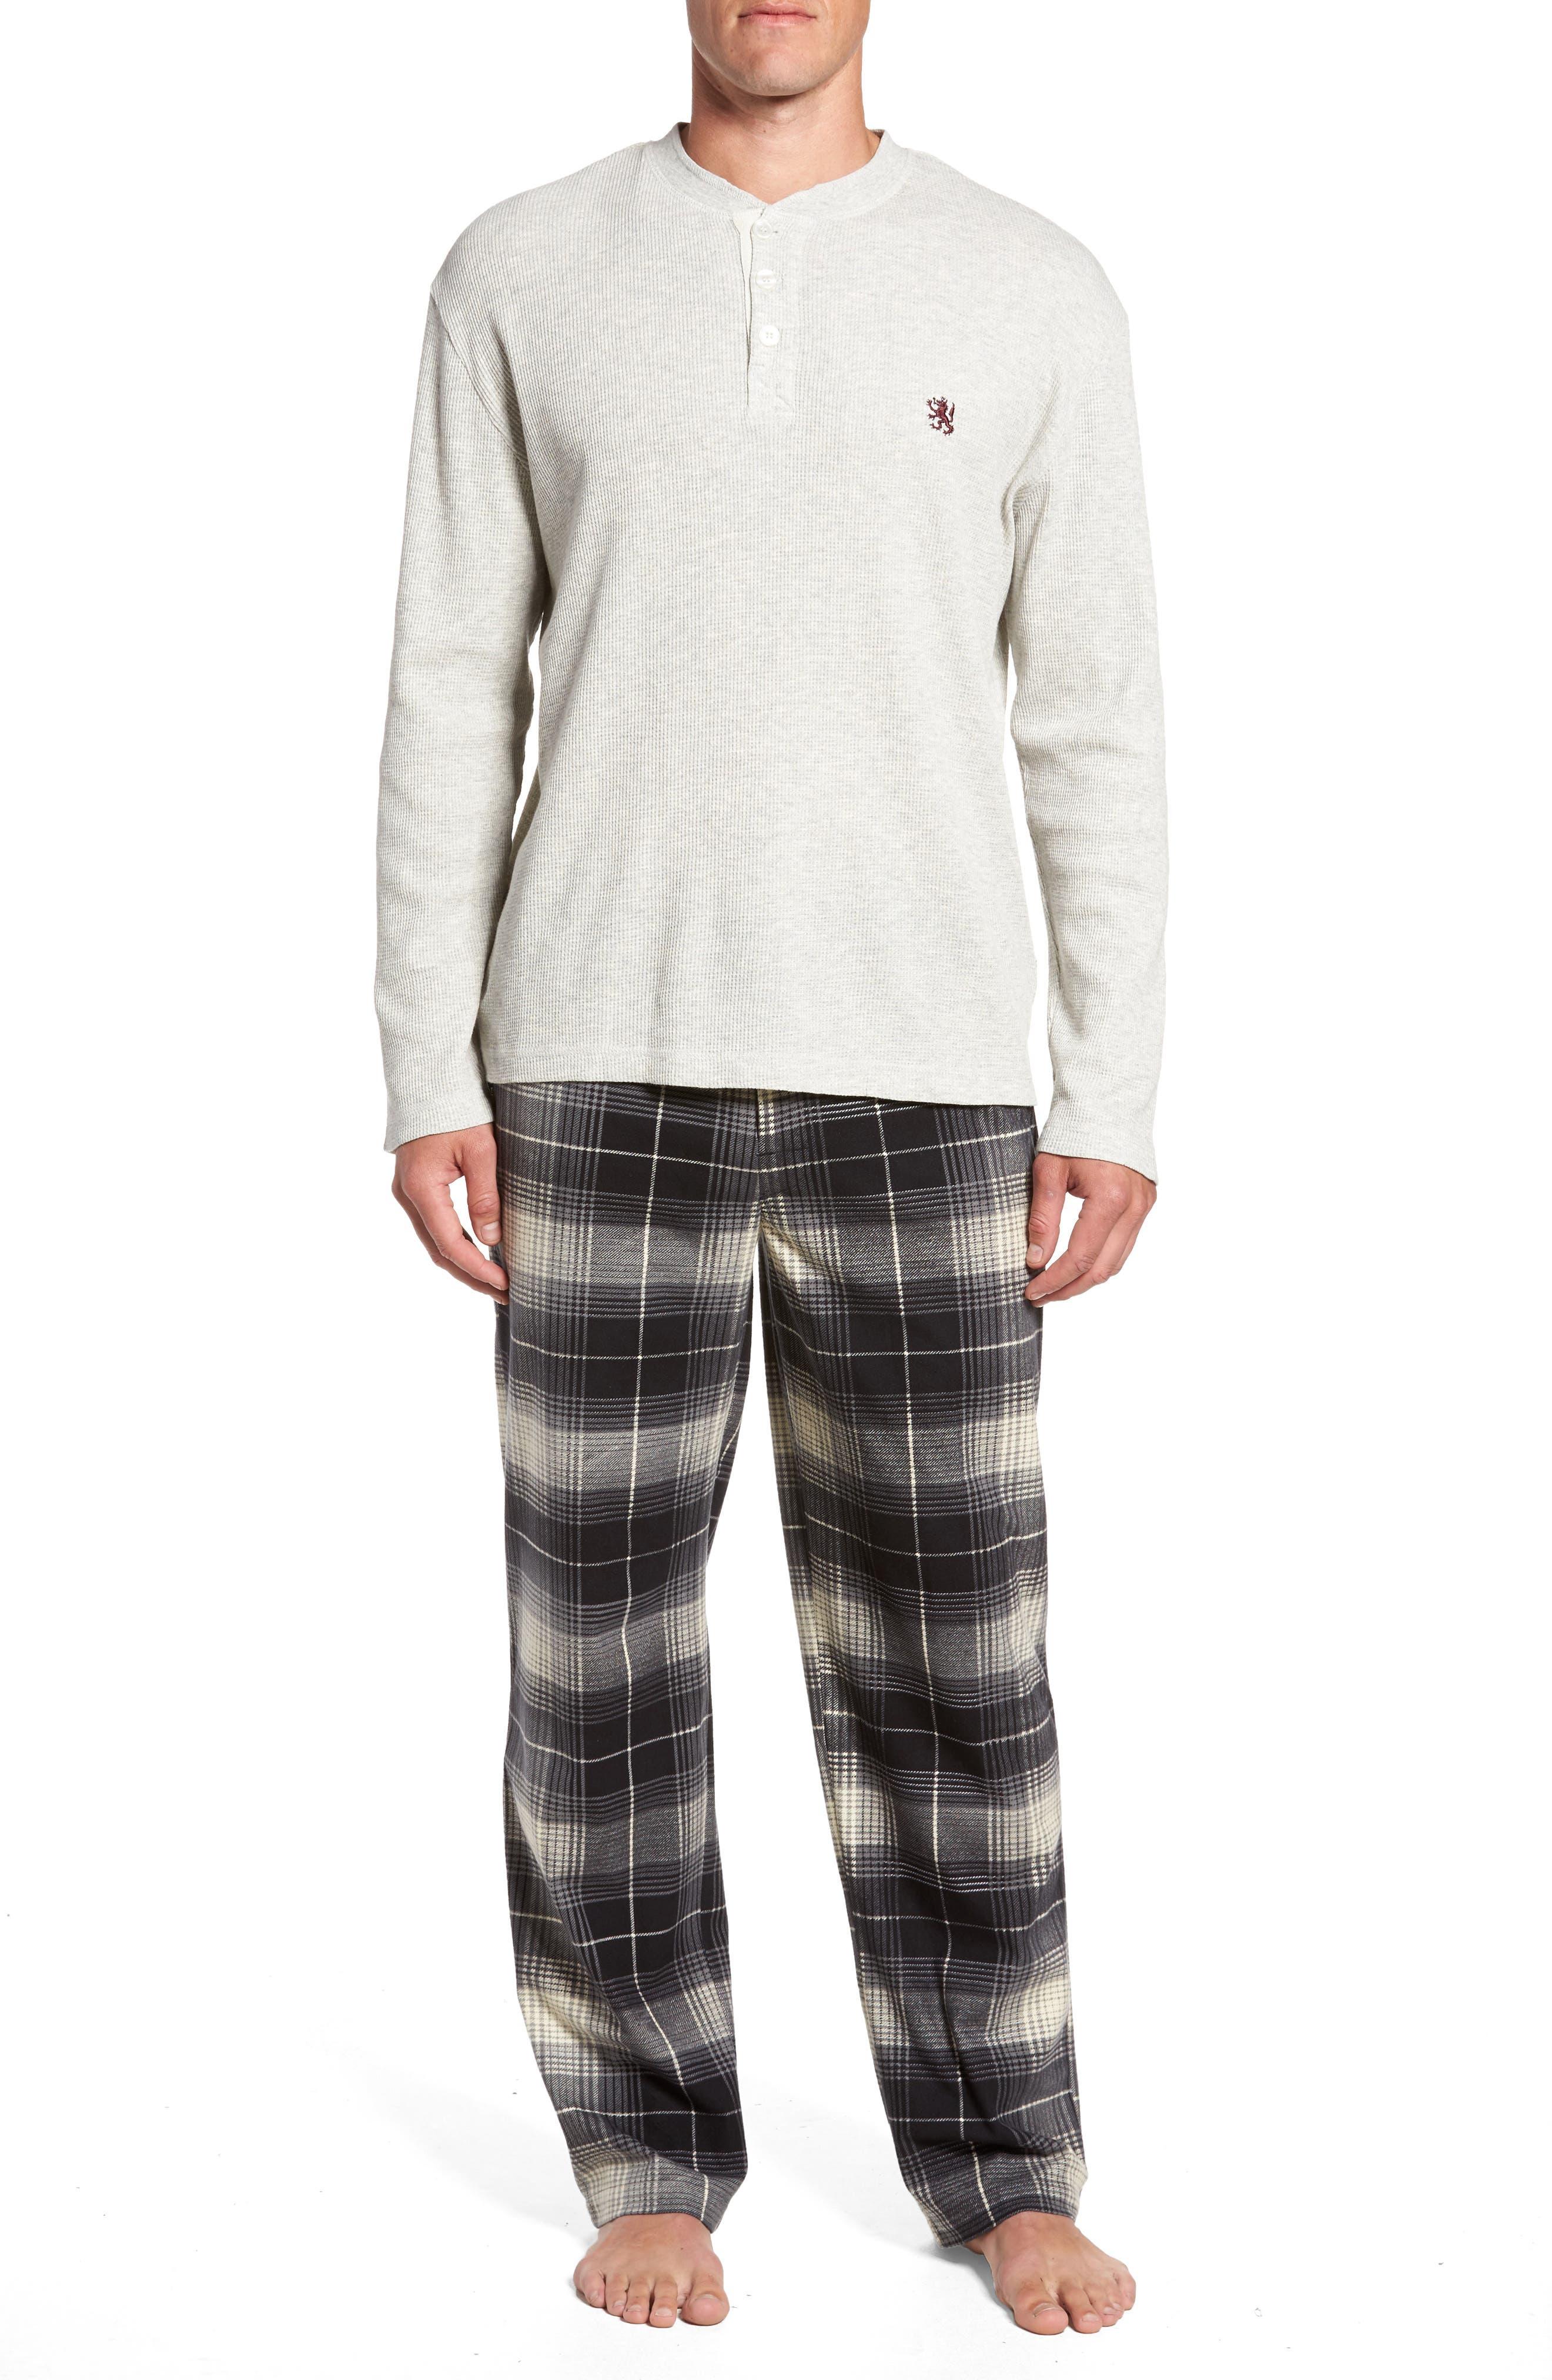 Majestic International Nifty Gift Henley Shirt & Lounge Pants